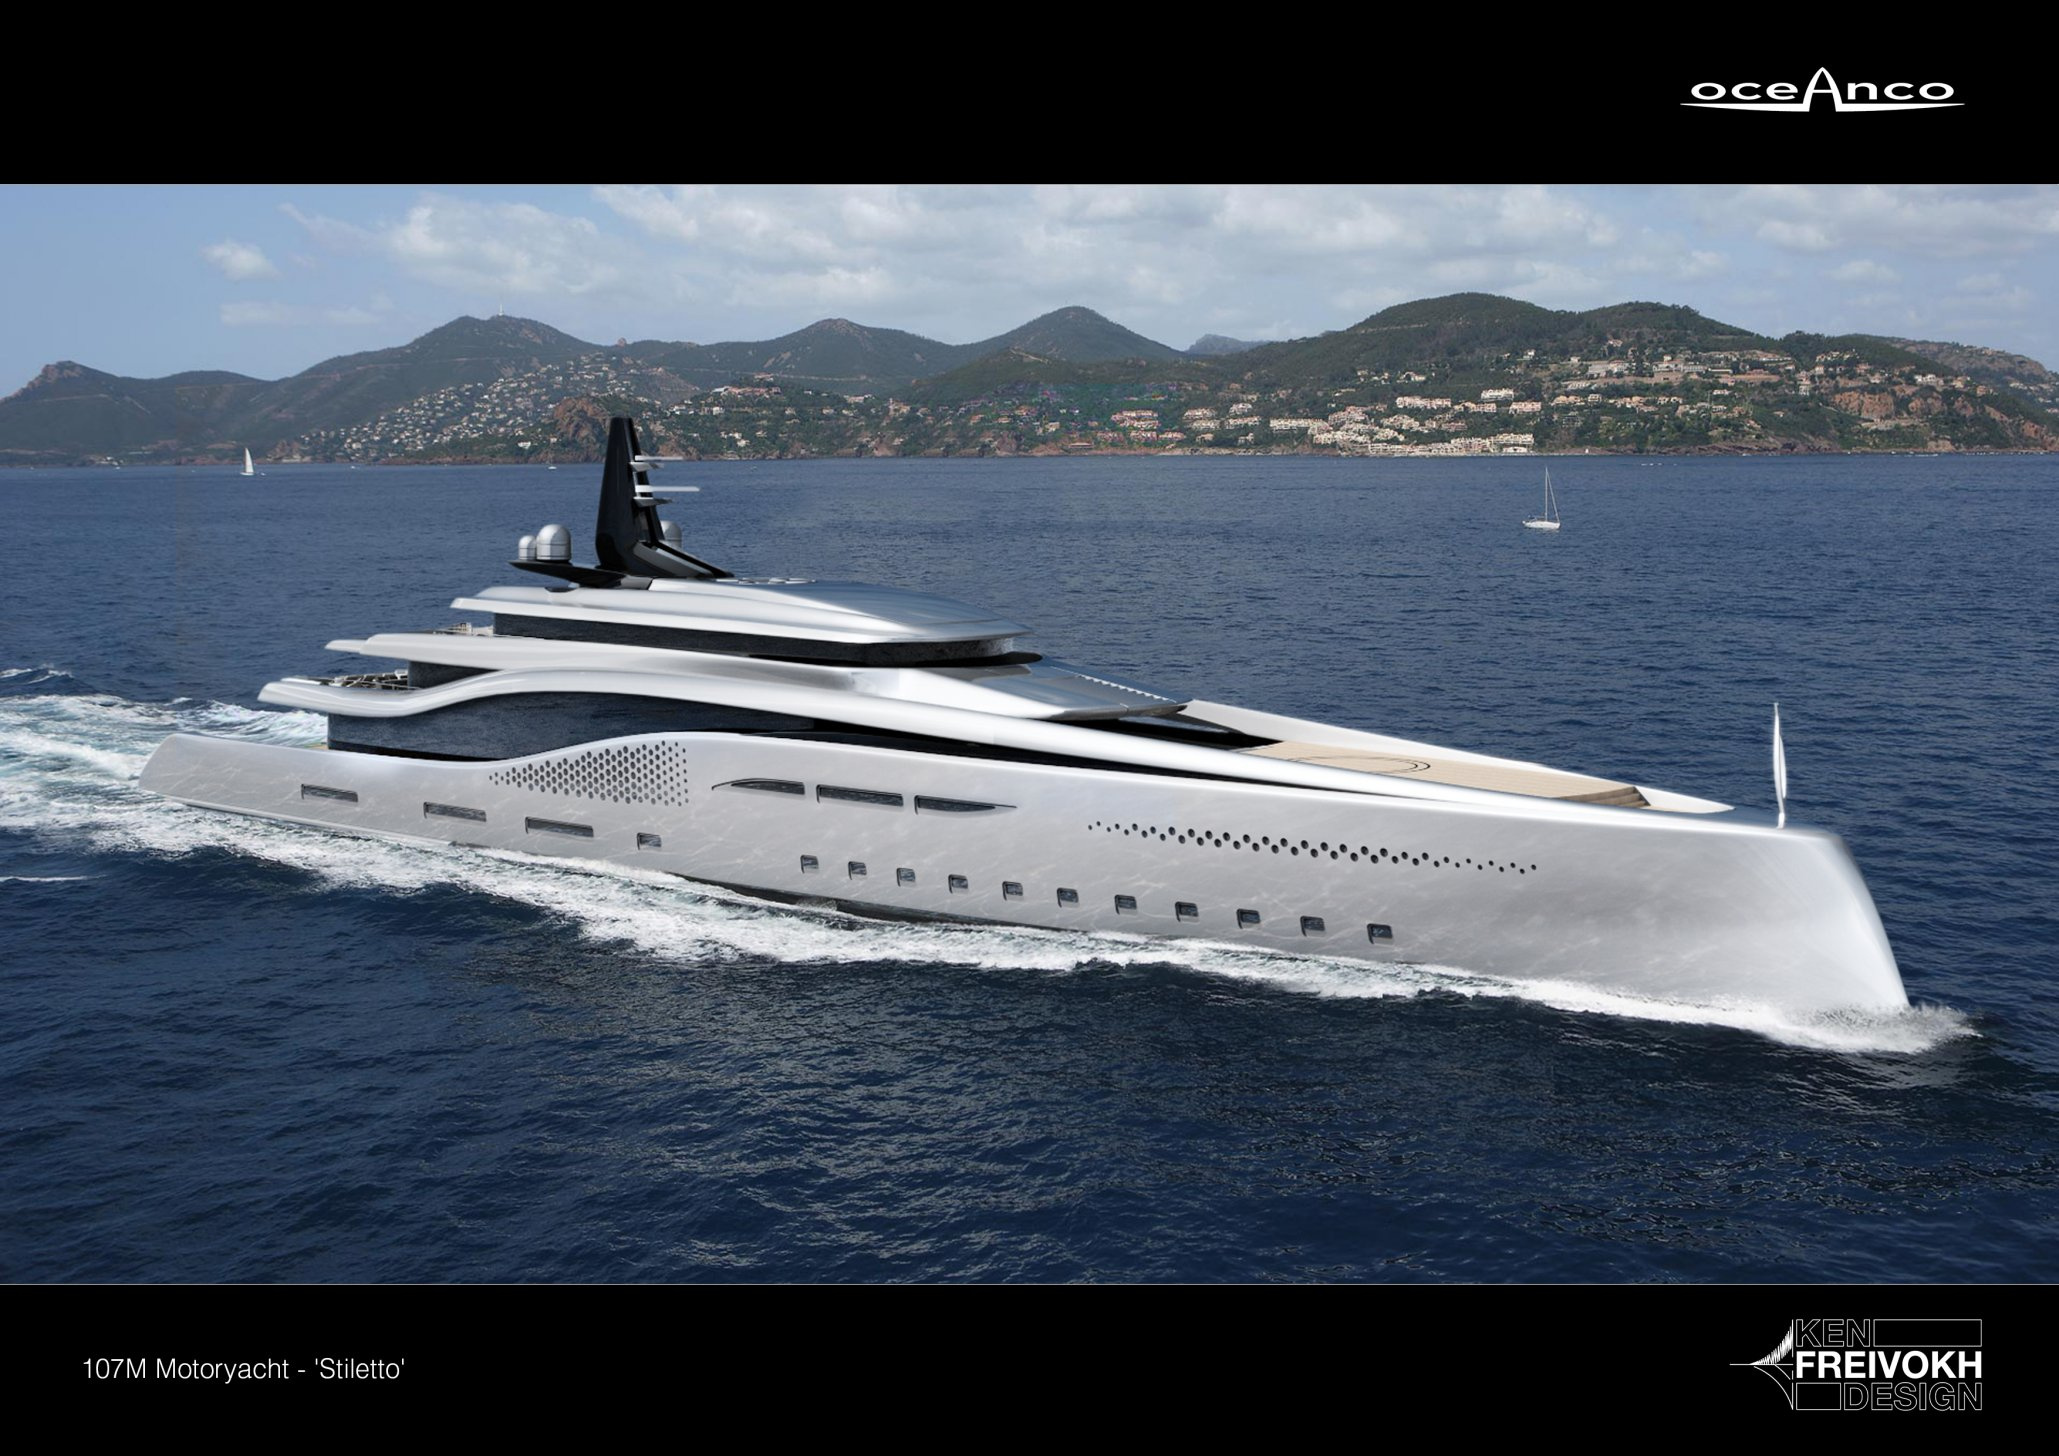 Luxusní jachta Oceanco Stiletto